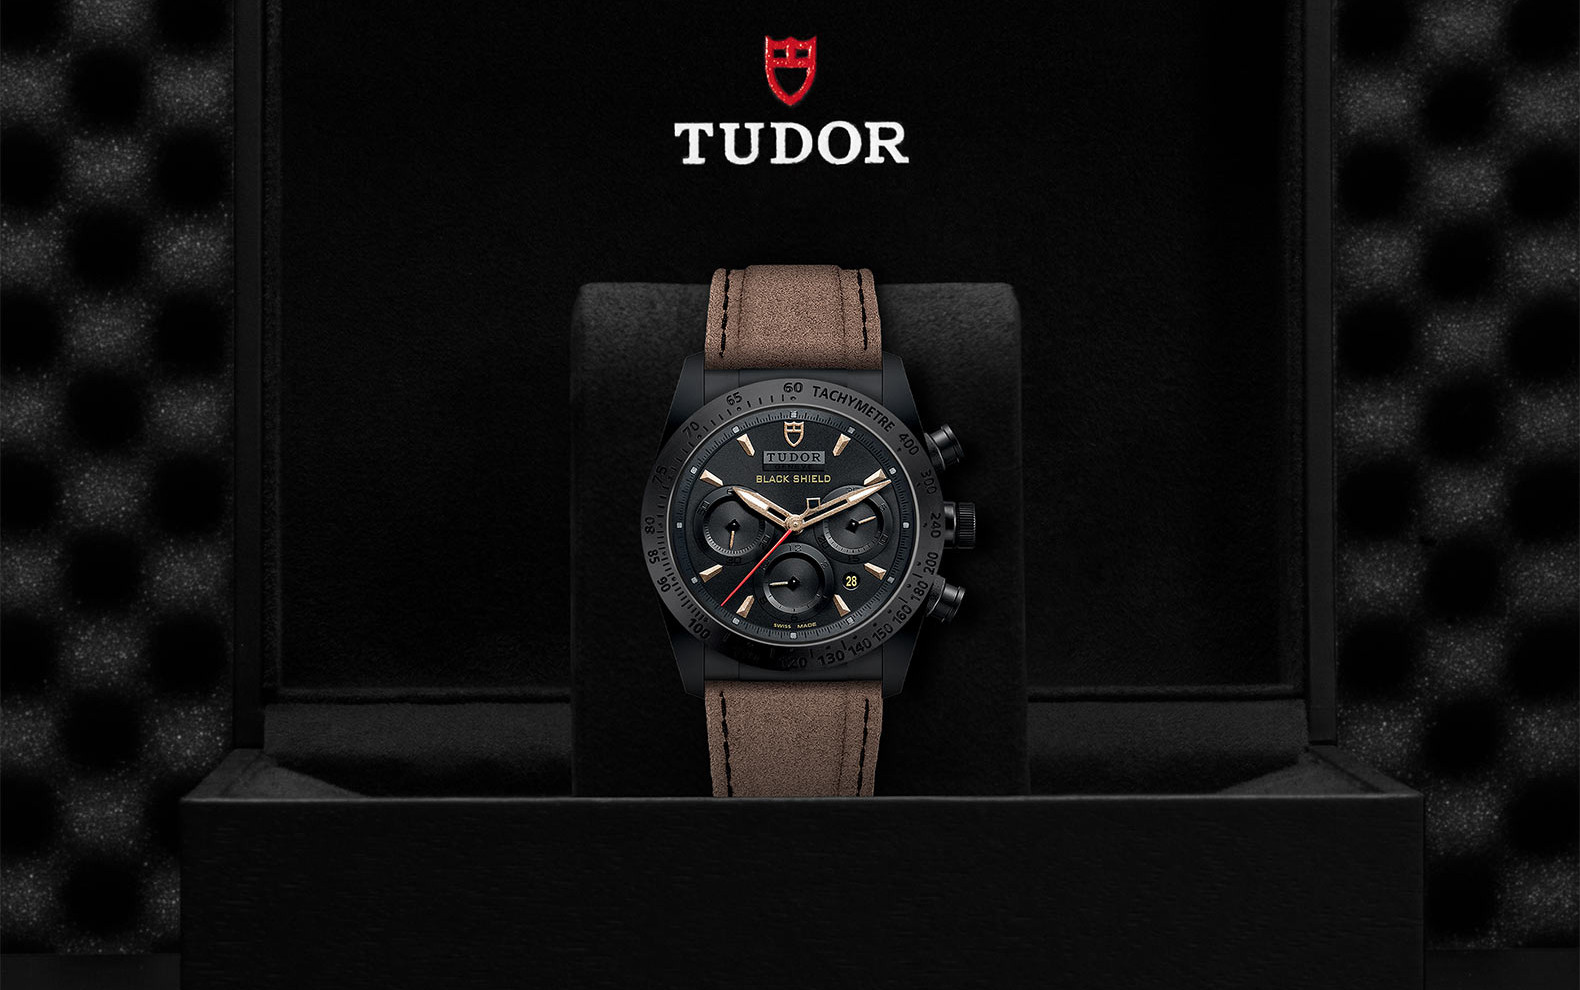 TUDOR_FASTRIDER BLACK SHIELD M42000CN-0016